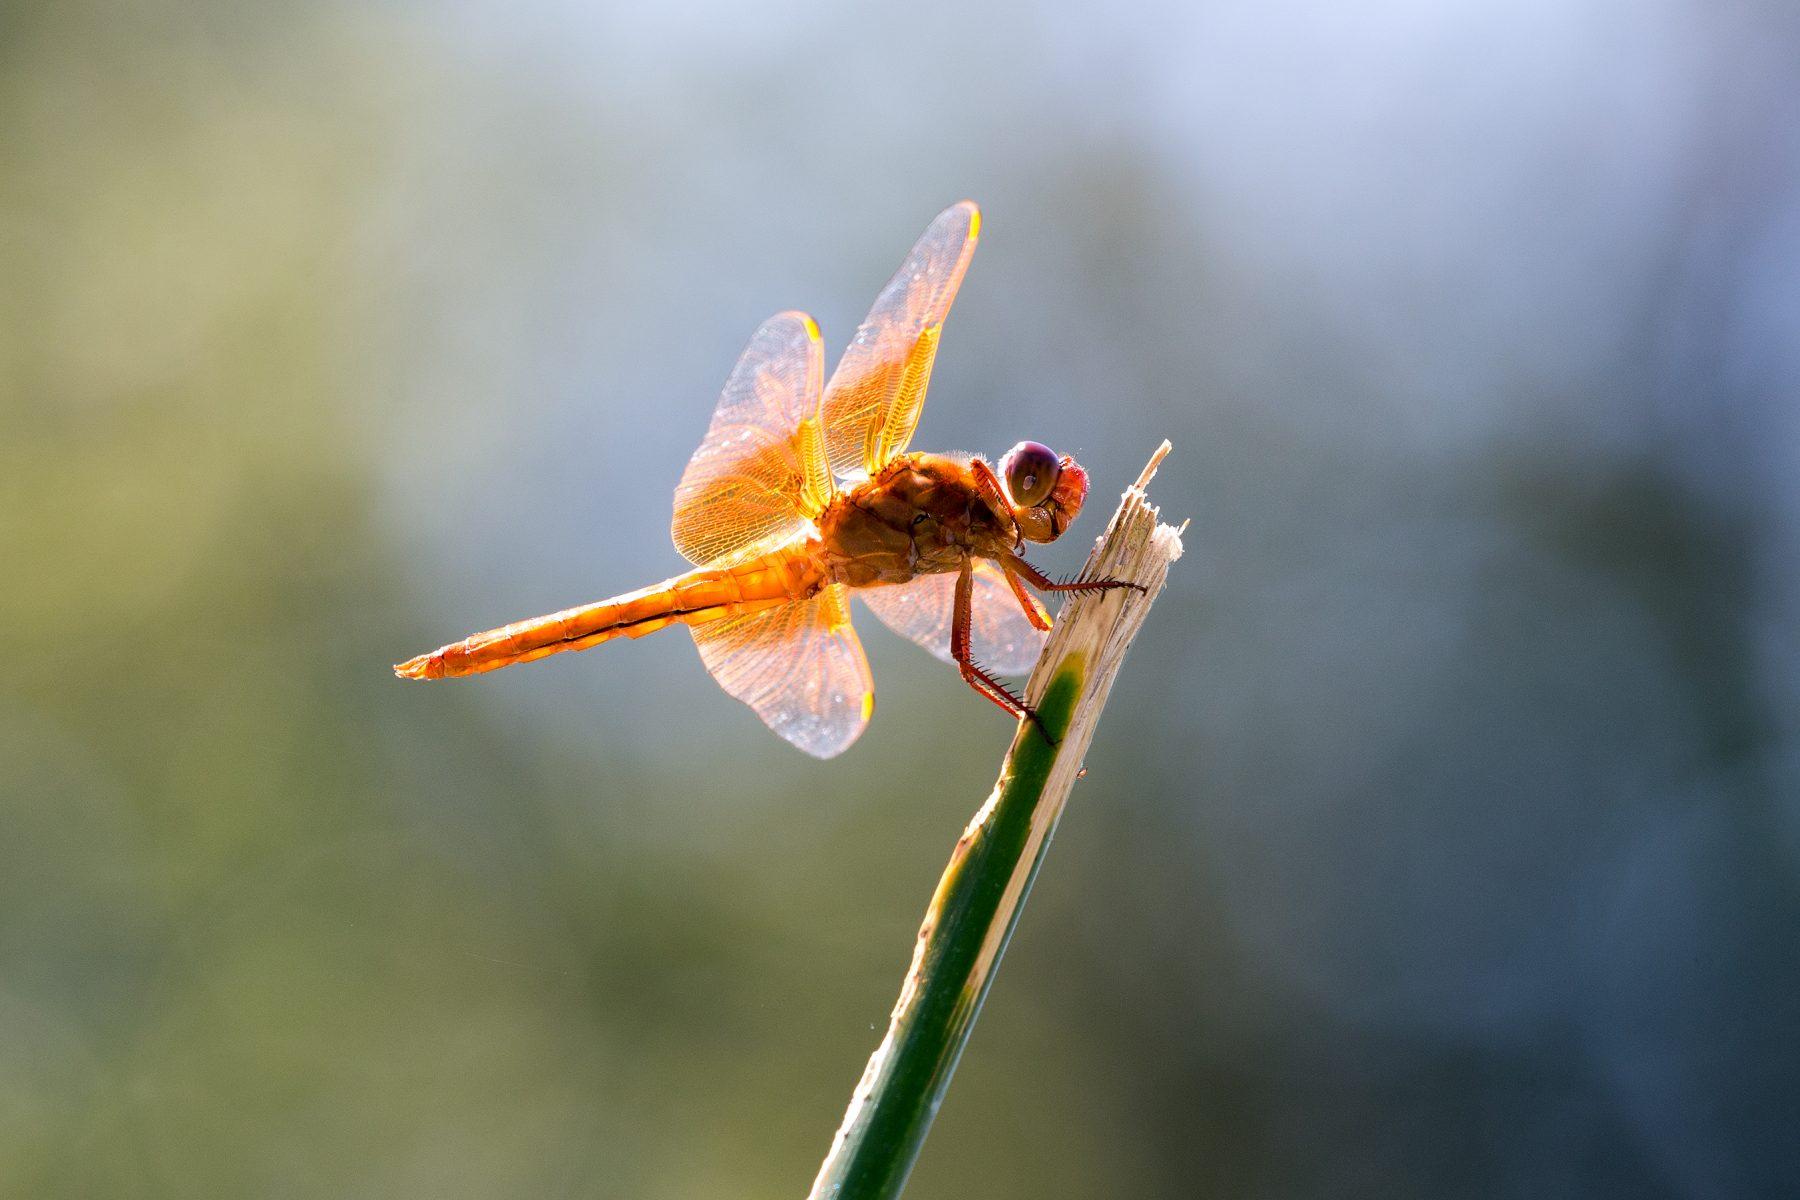 Dragonfly by Tom Applegate